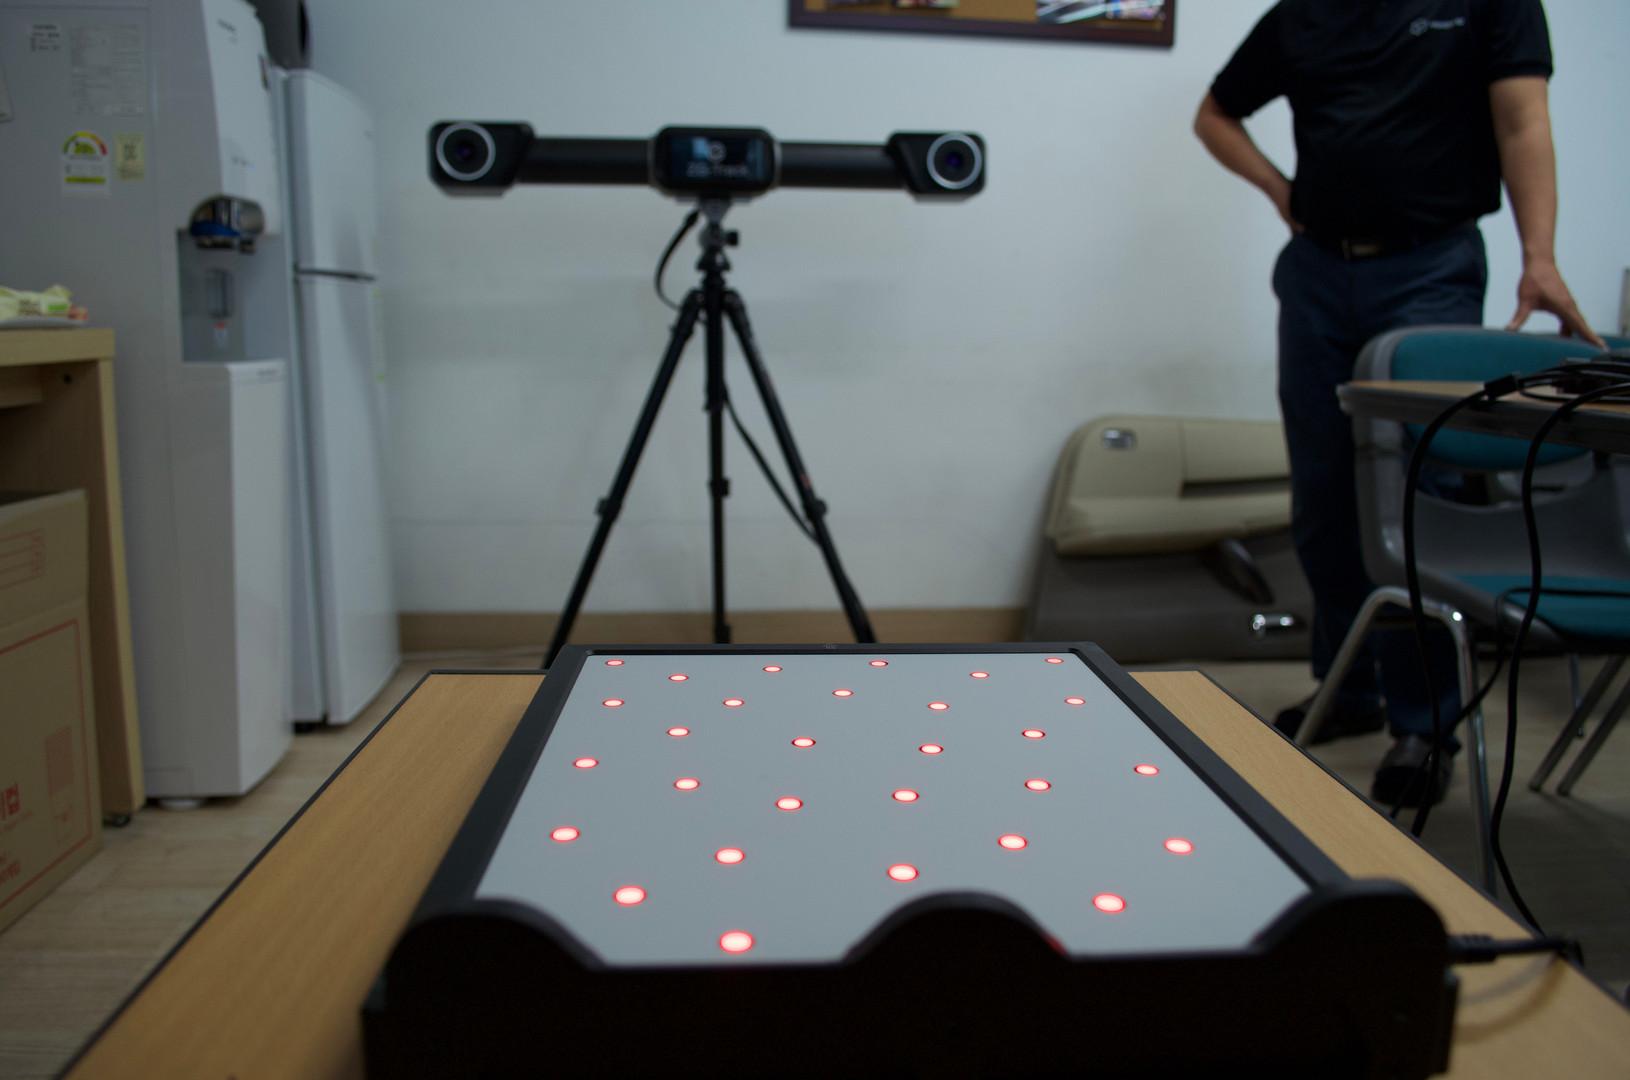 HyperScan과 ZG-Track 사이 칼리브레이션 준비